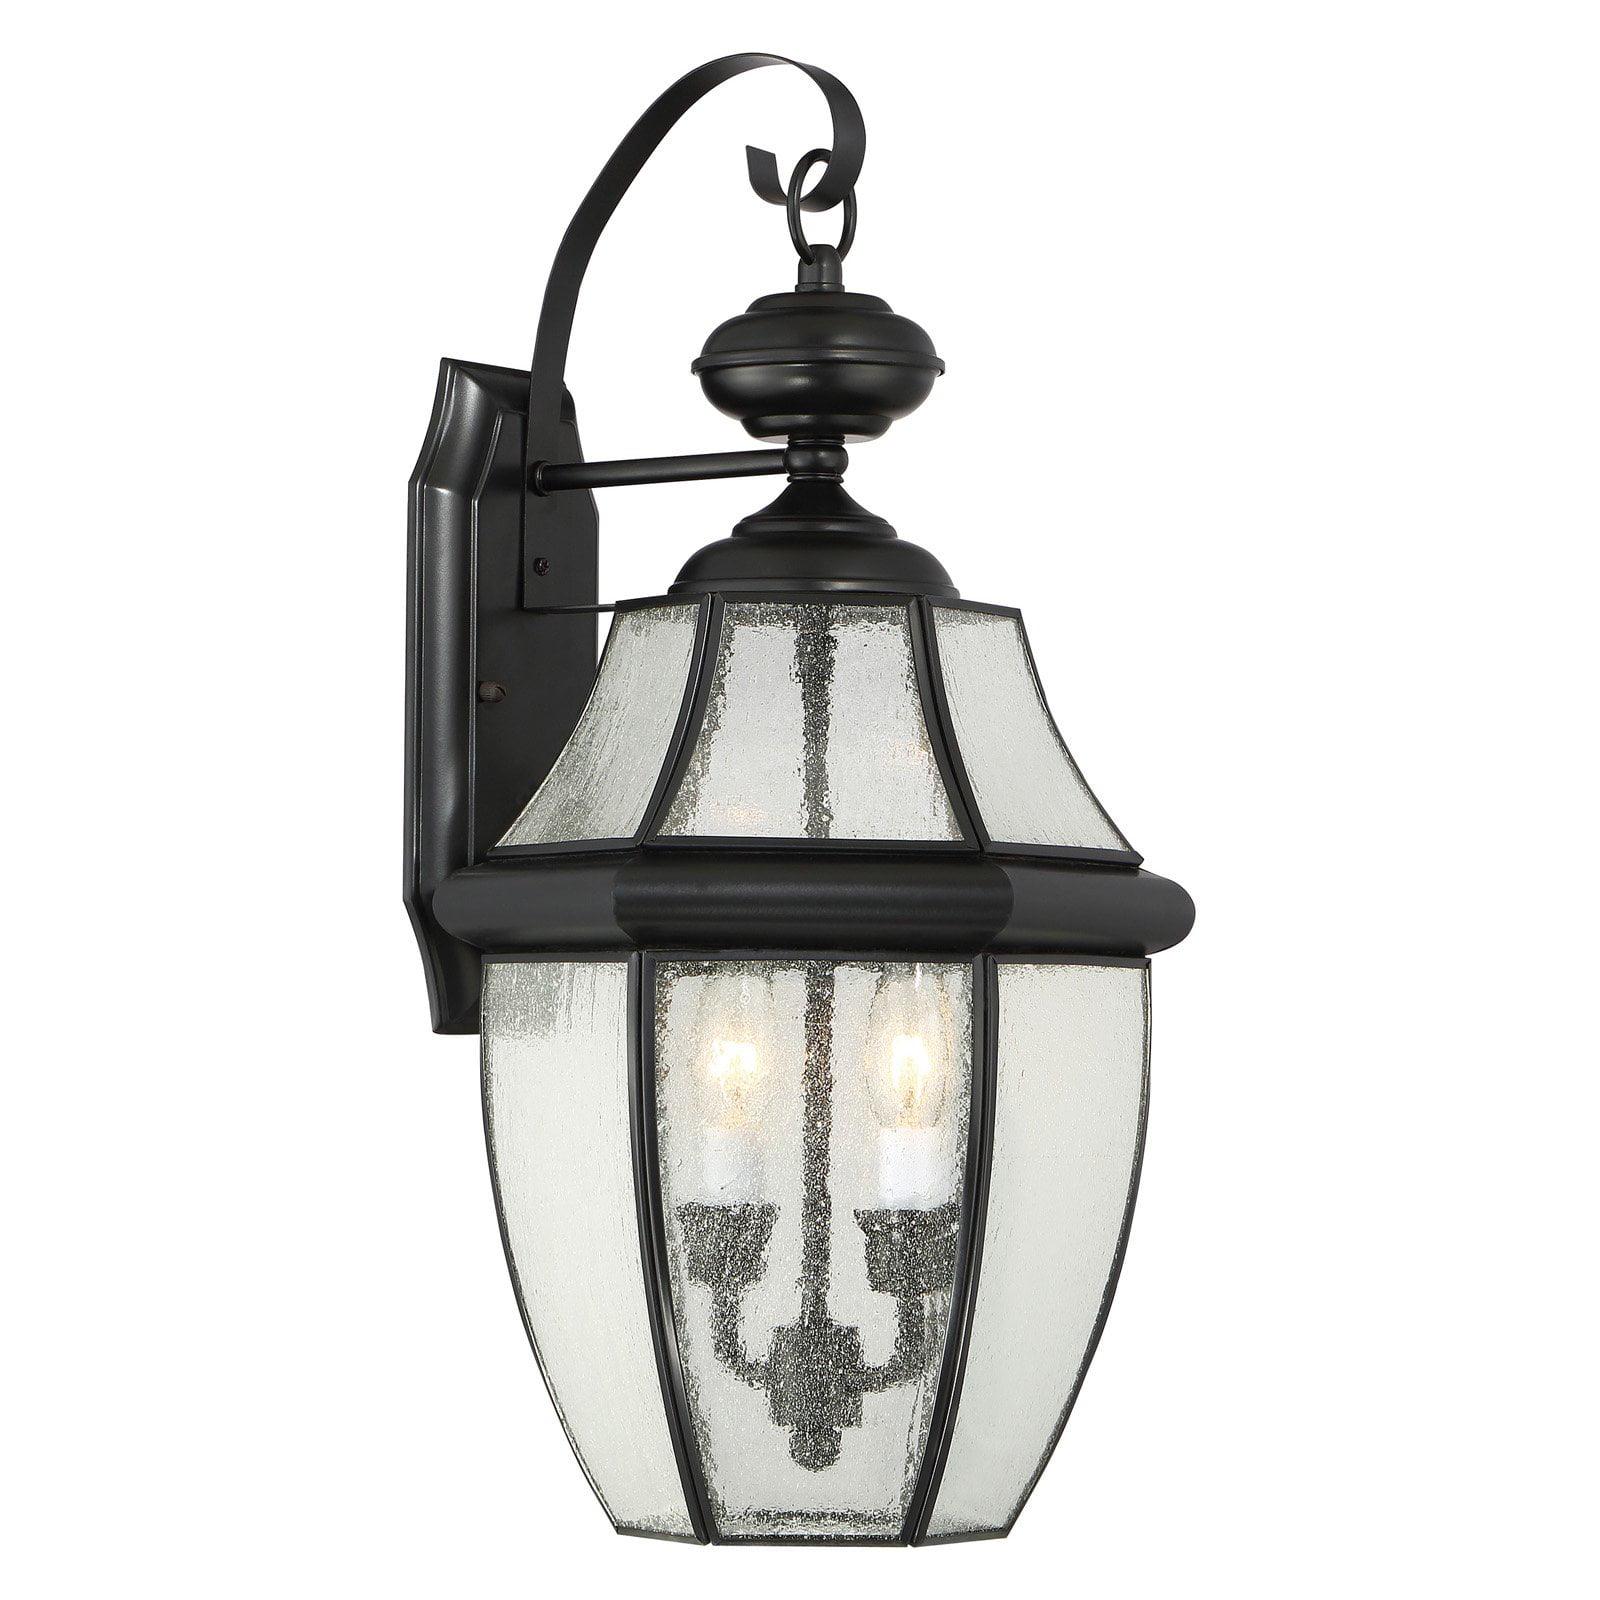 Quoizel Newbury NY84 Outdoor Candelabra Wall Lantern